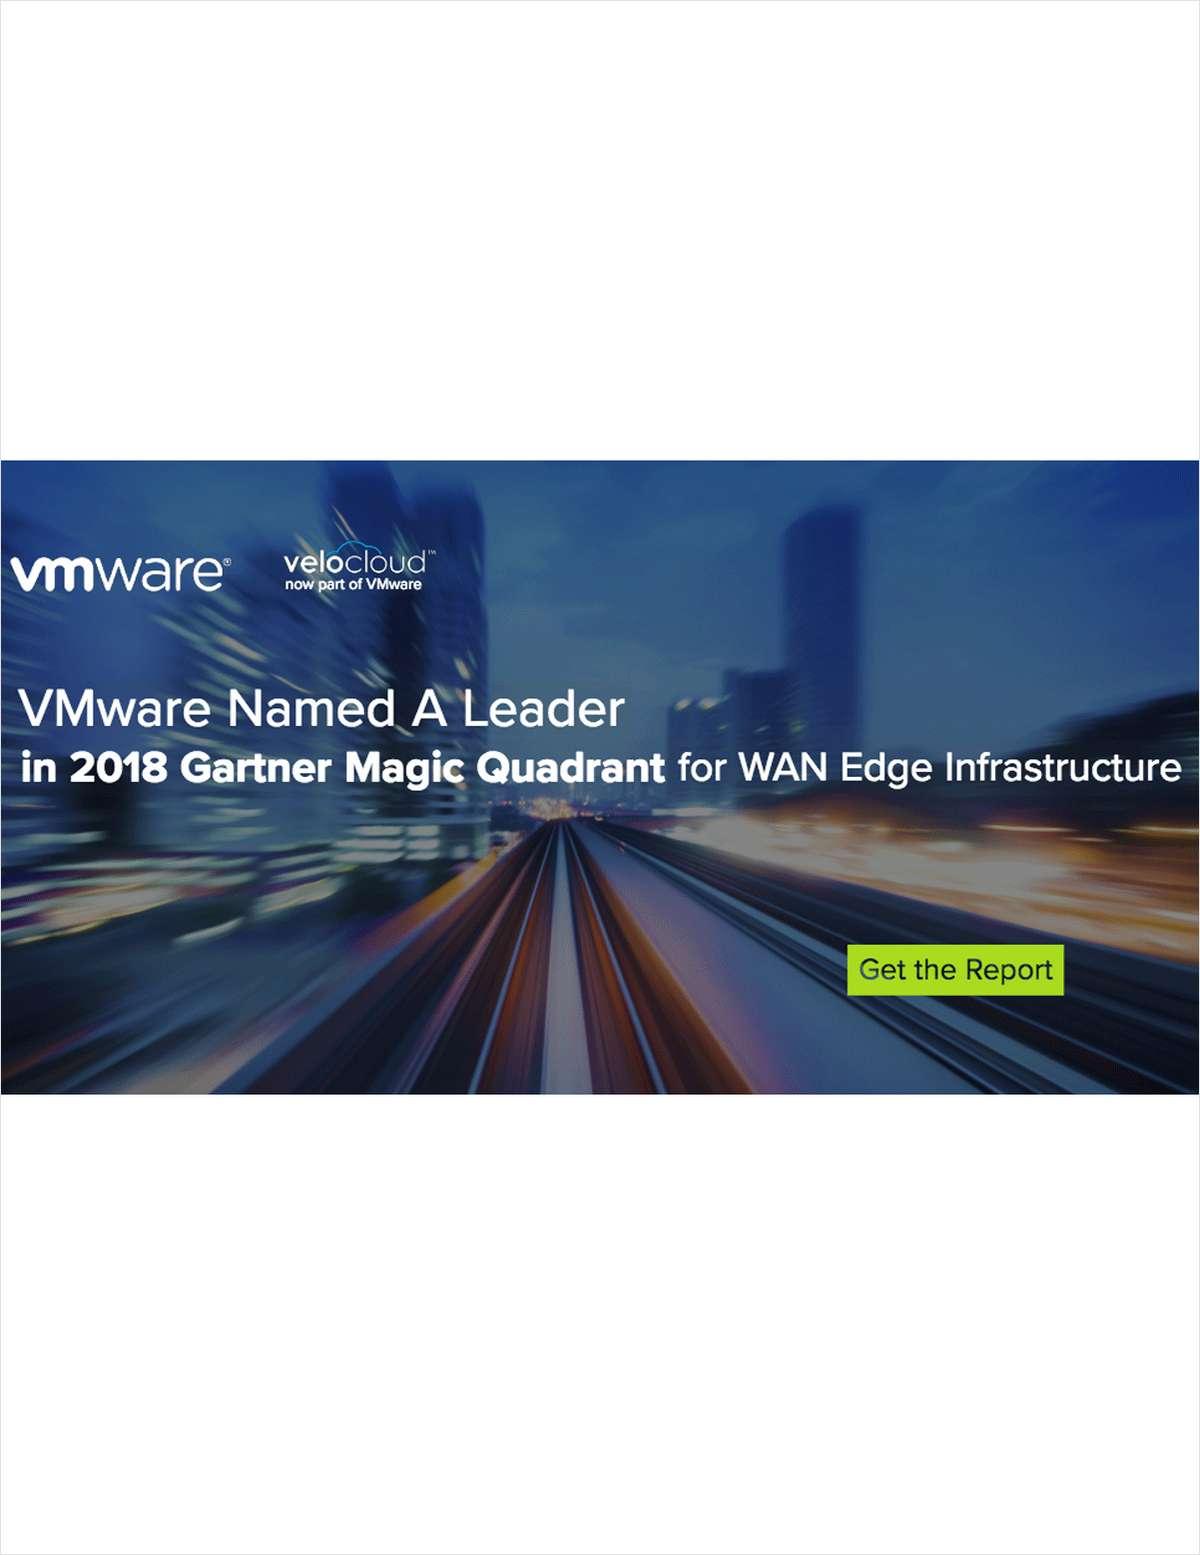 Gartner Magic Quadrant 2018 WAN Edge Infrastructure, Free